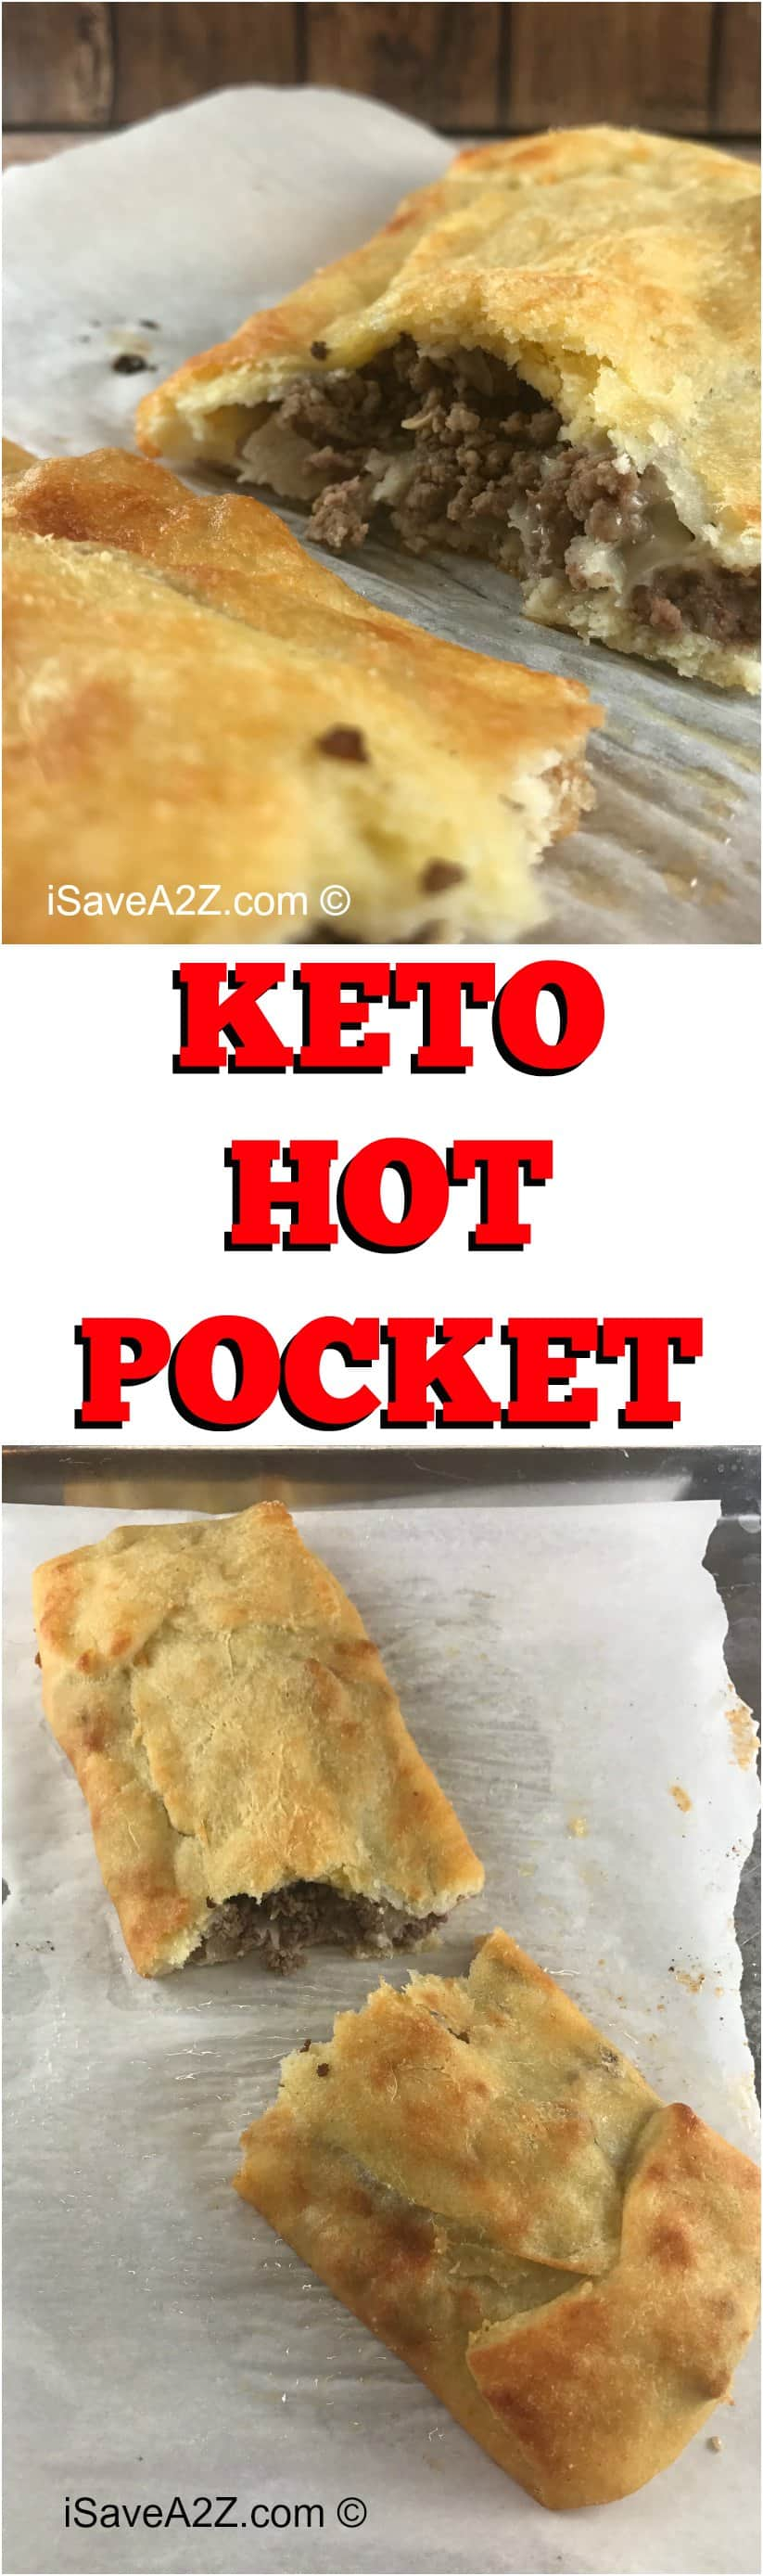 hot pocket oven instructions